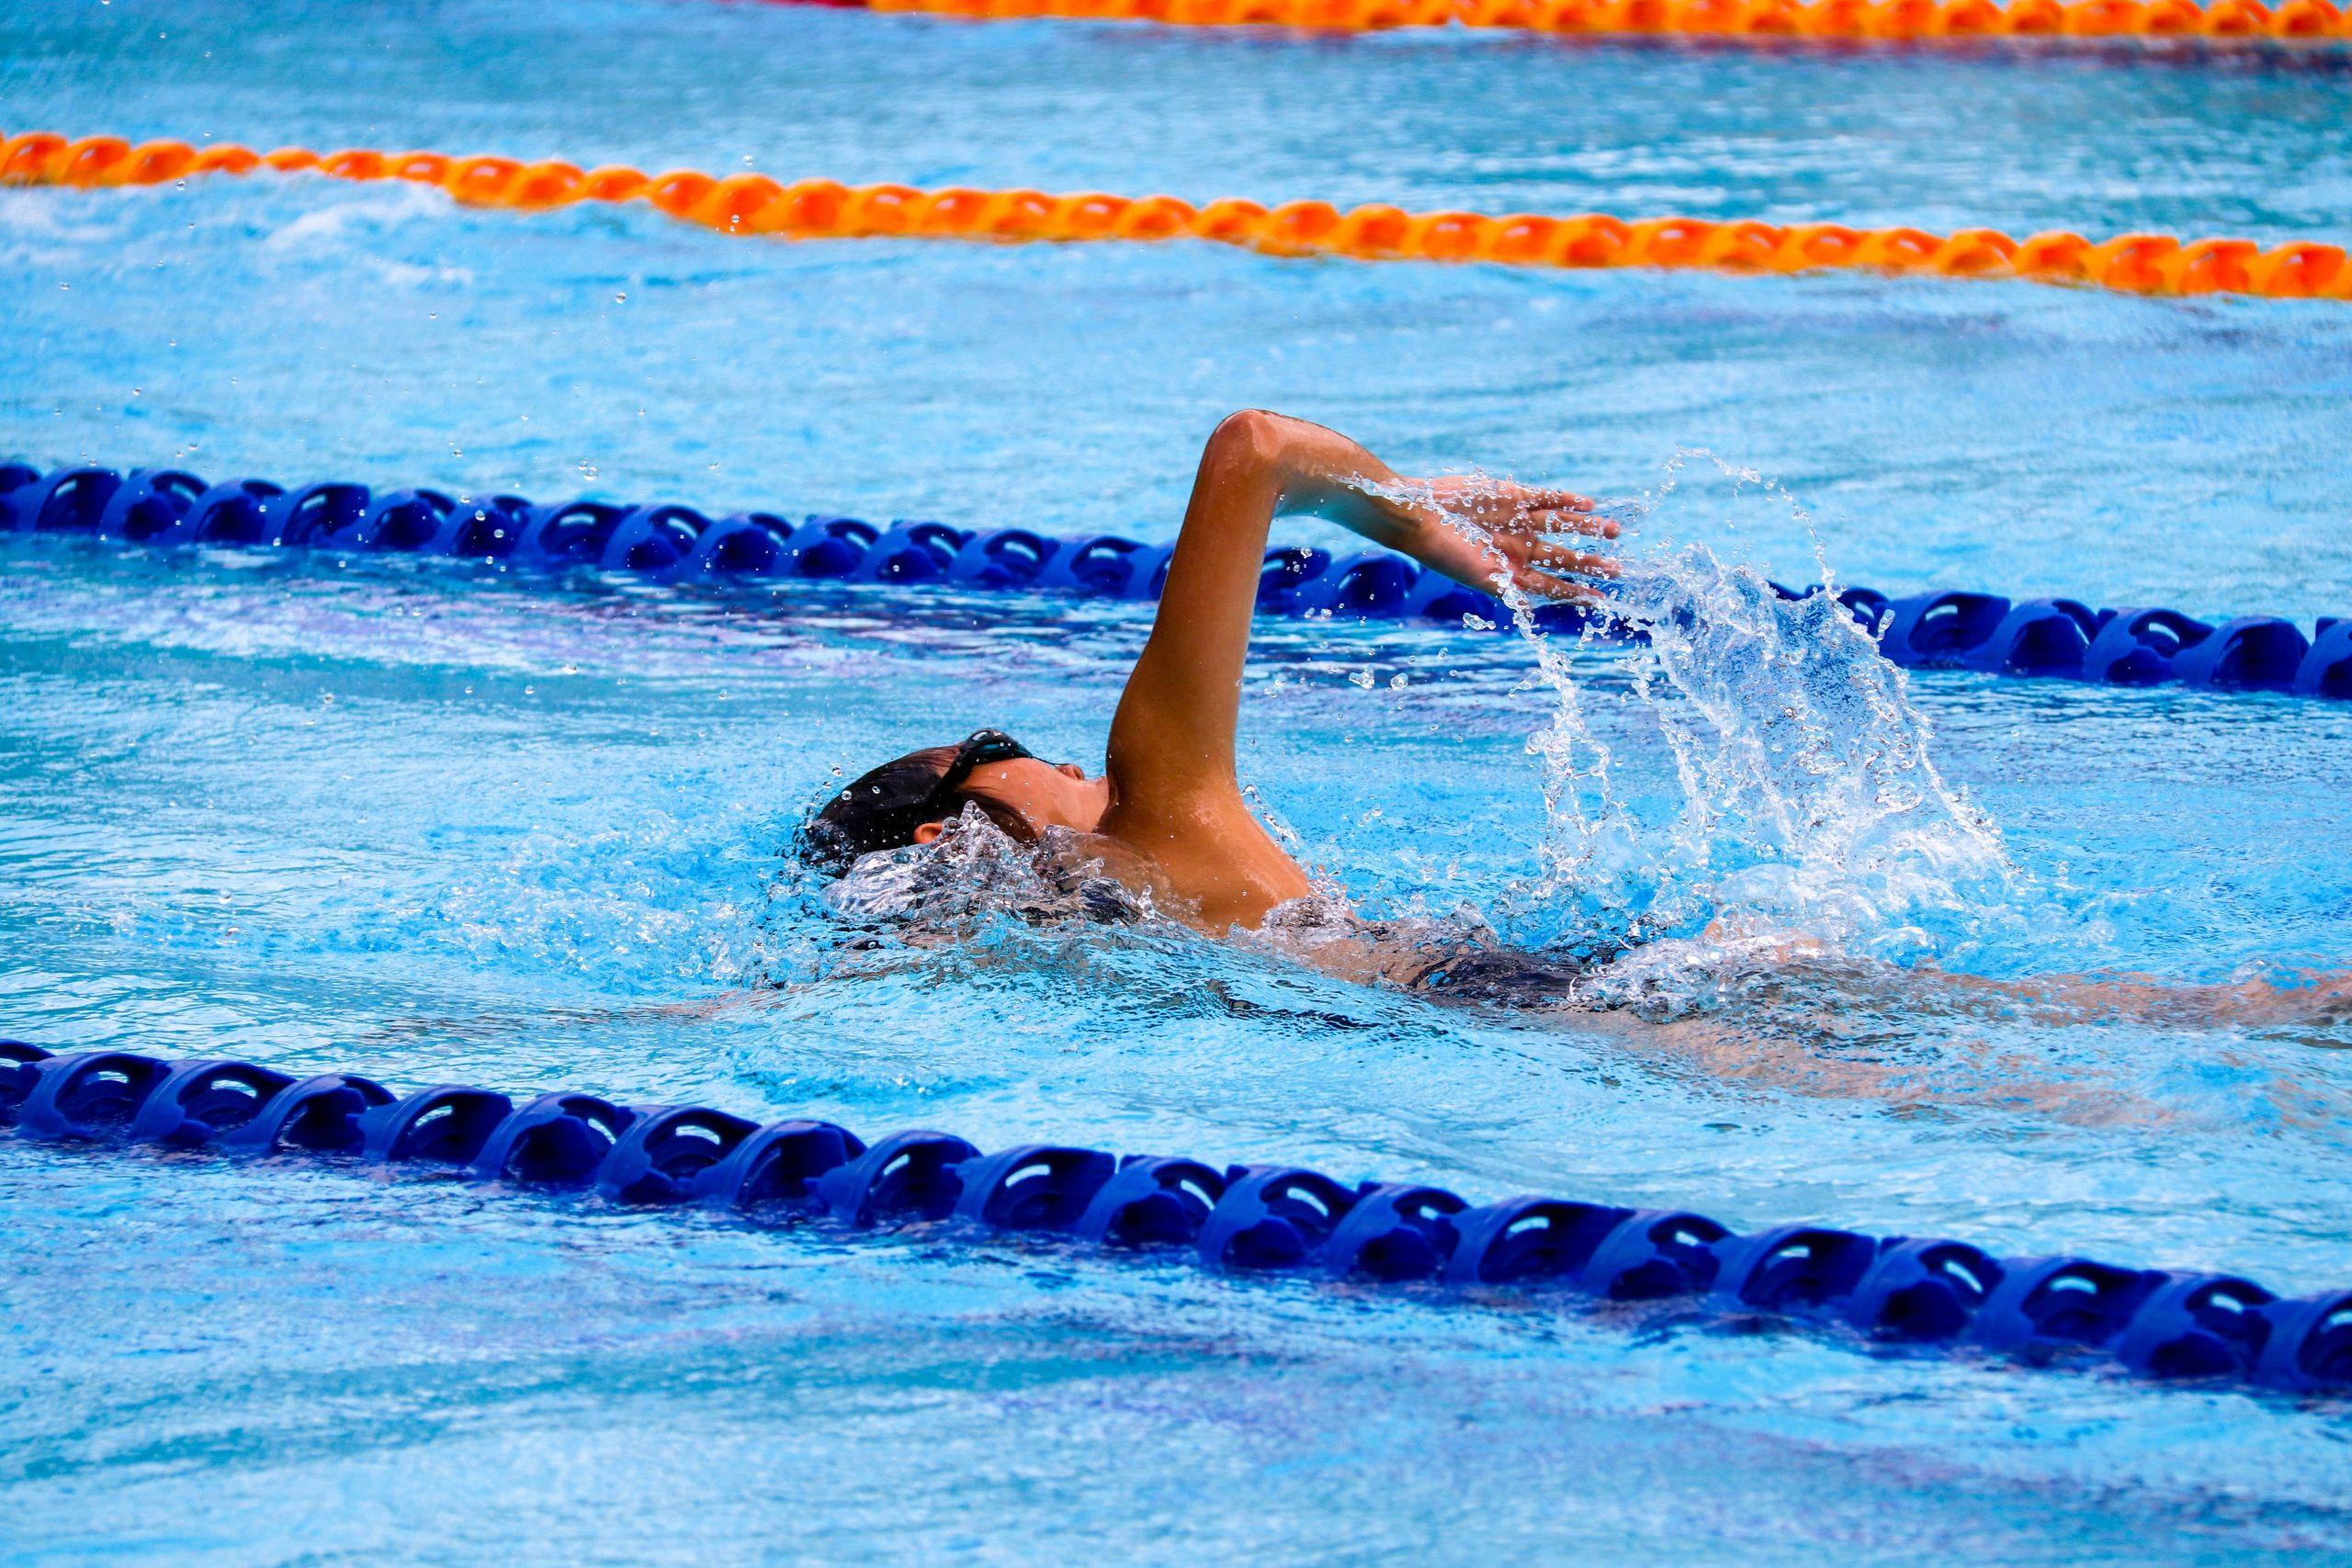 Quels sont les avantages de la natation ? 1